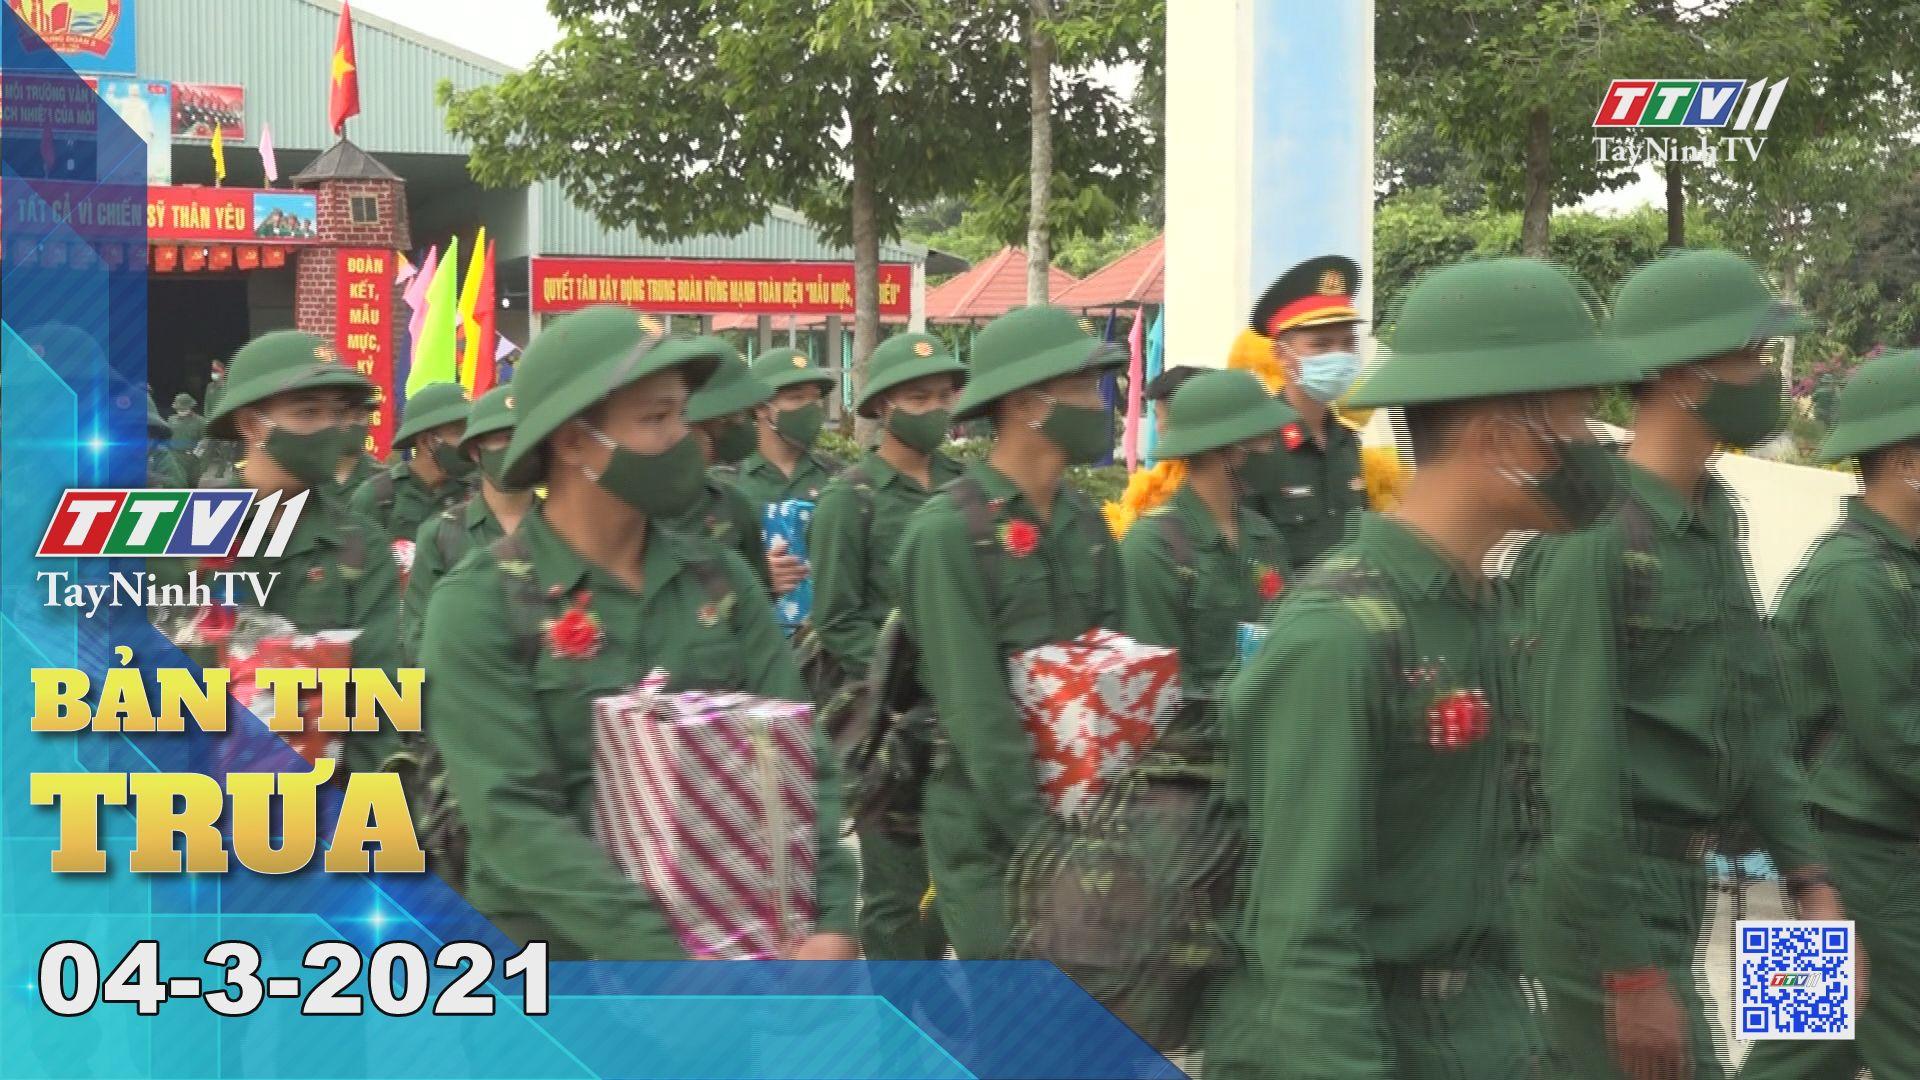 Bản tin trưa 04-3-2021 | Tin tức hôm nay | TayNinhTV